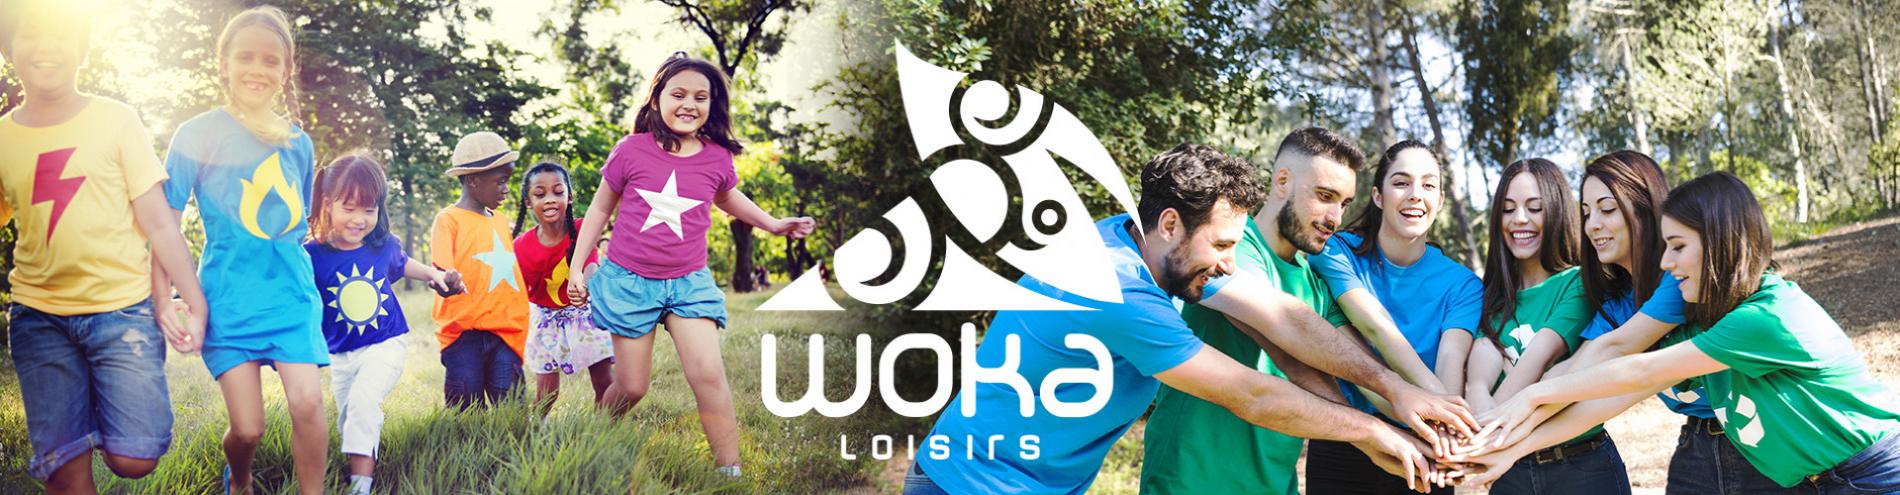 Woka loisirs - Offres